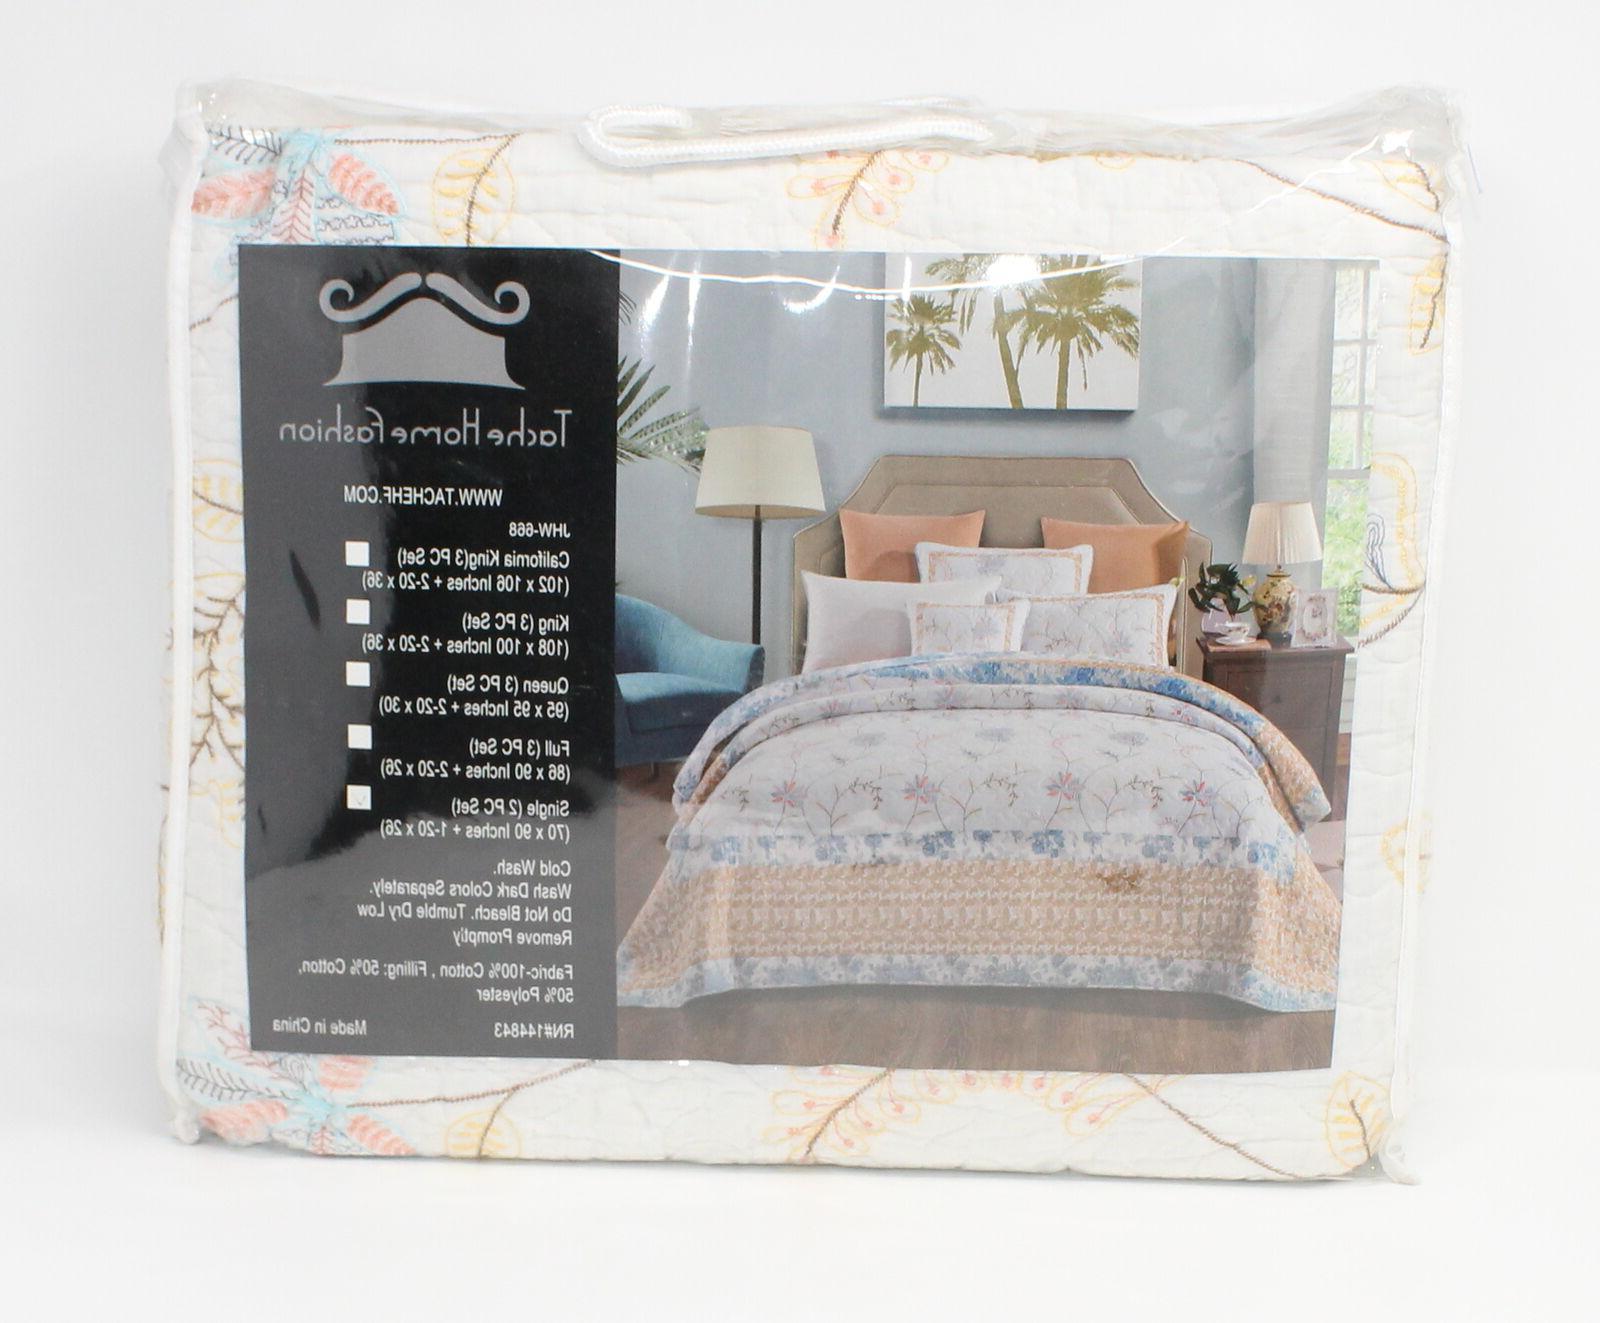 winter frost embroidered floral quilt bedspread set